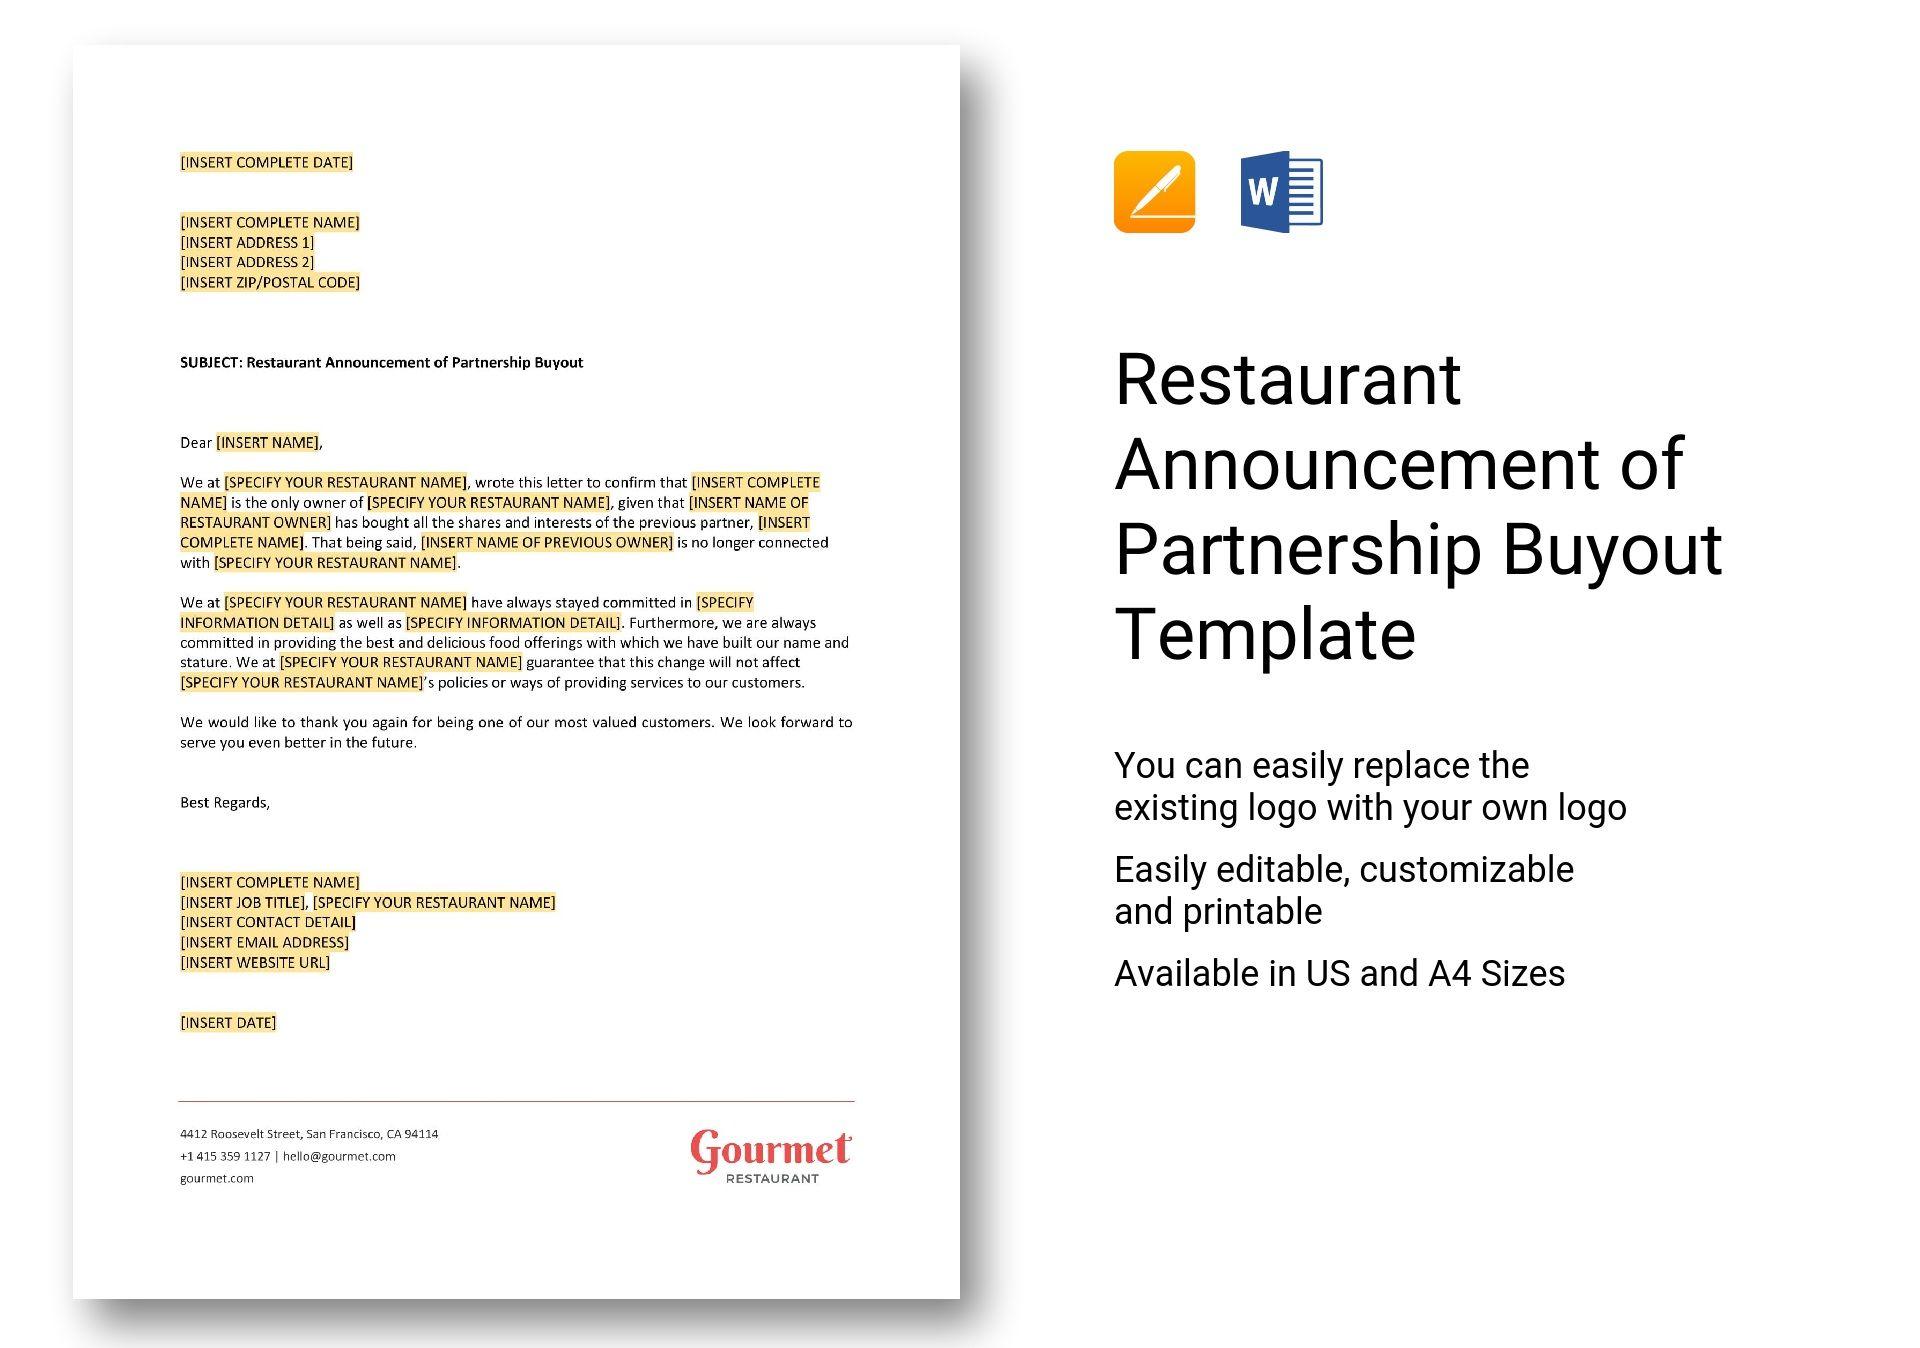 Restaurant Announcement of Partnership Buyout